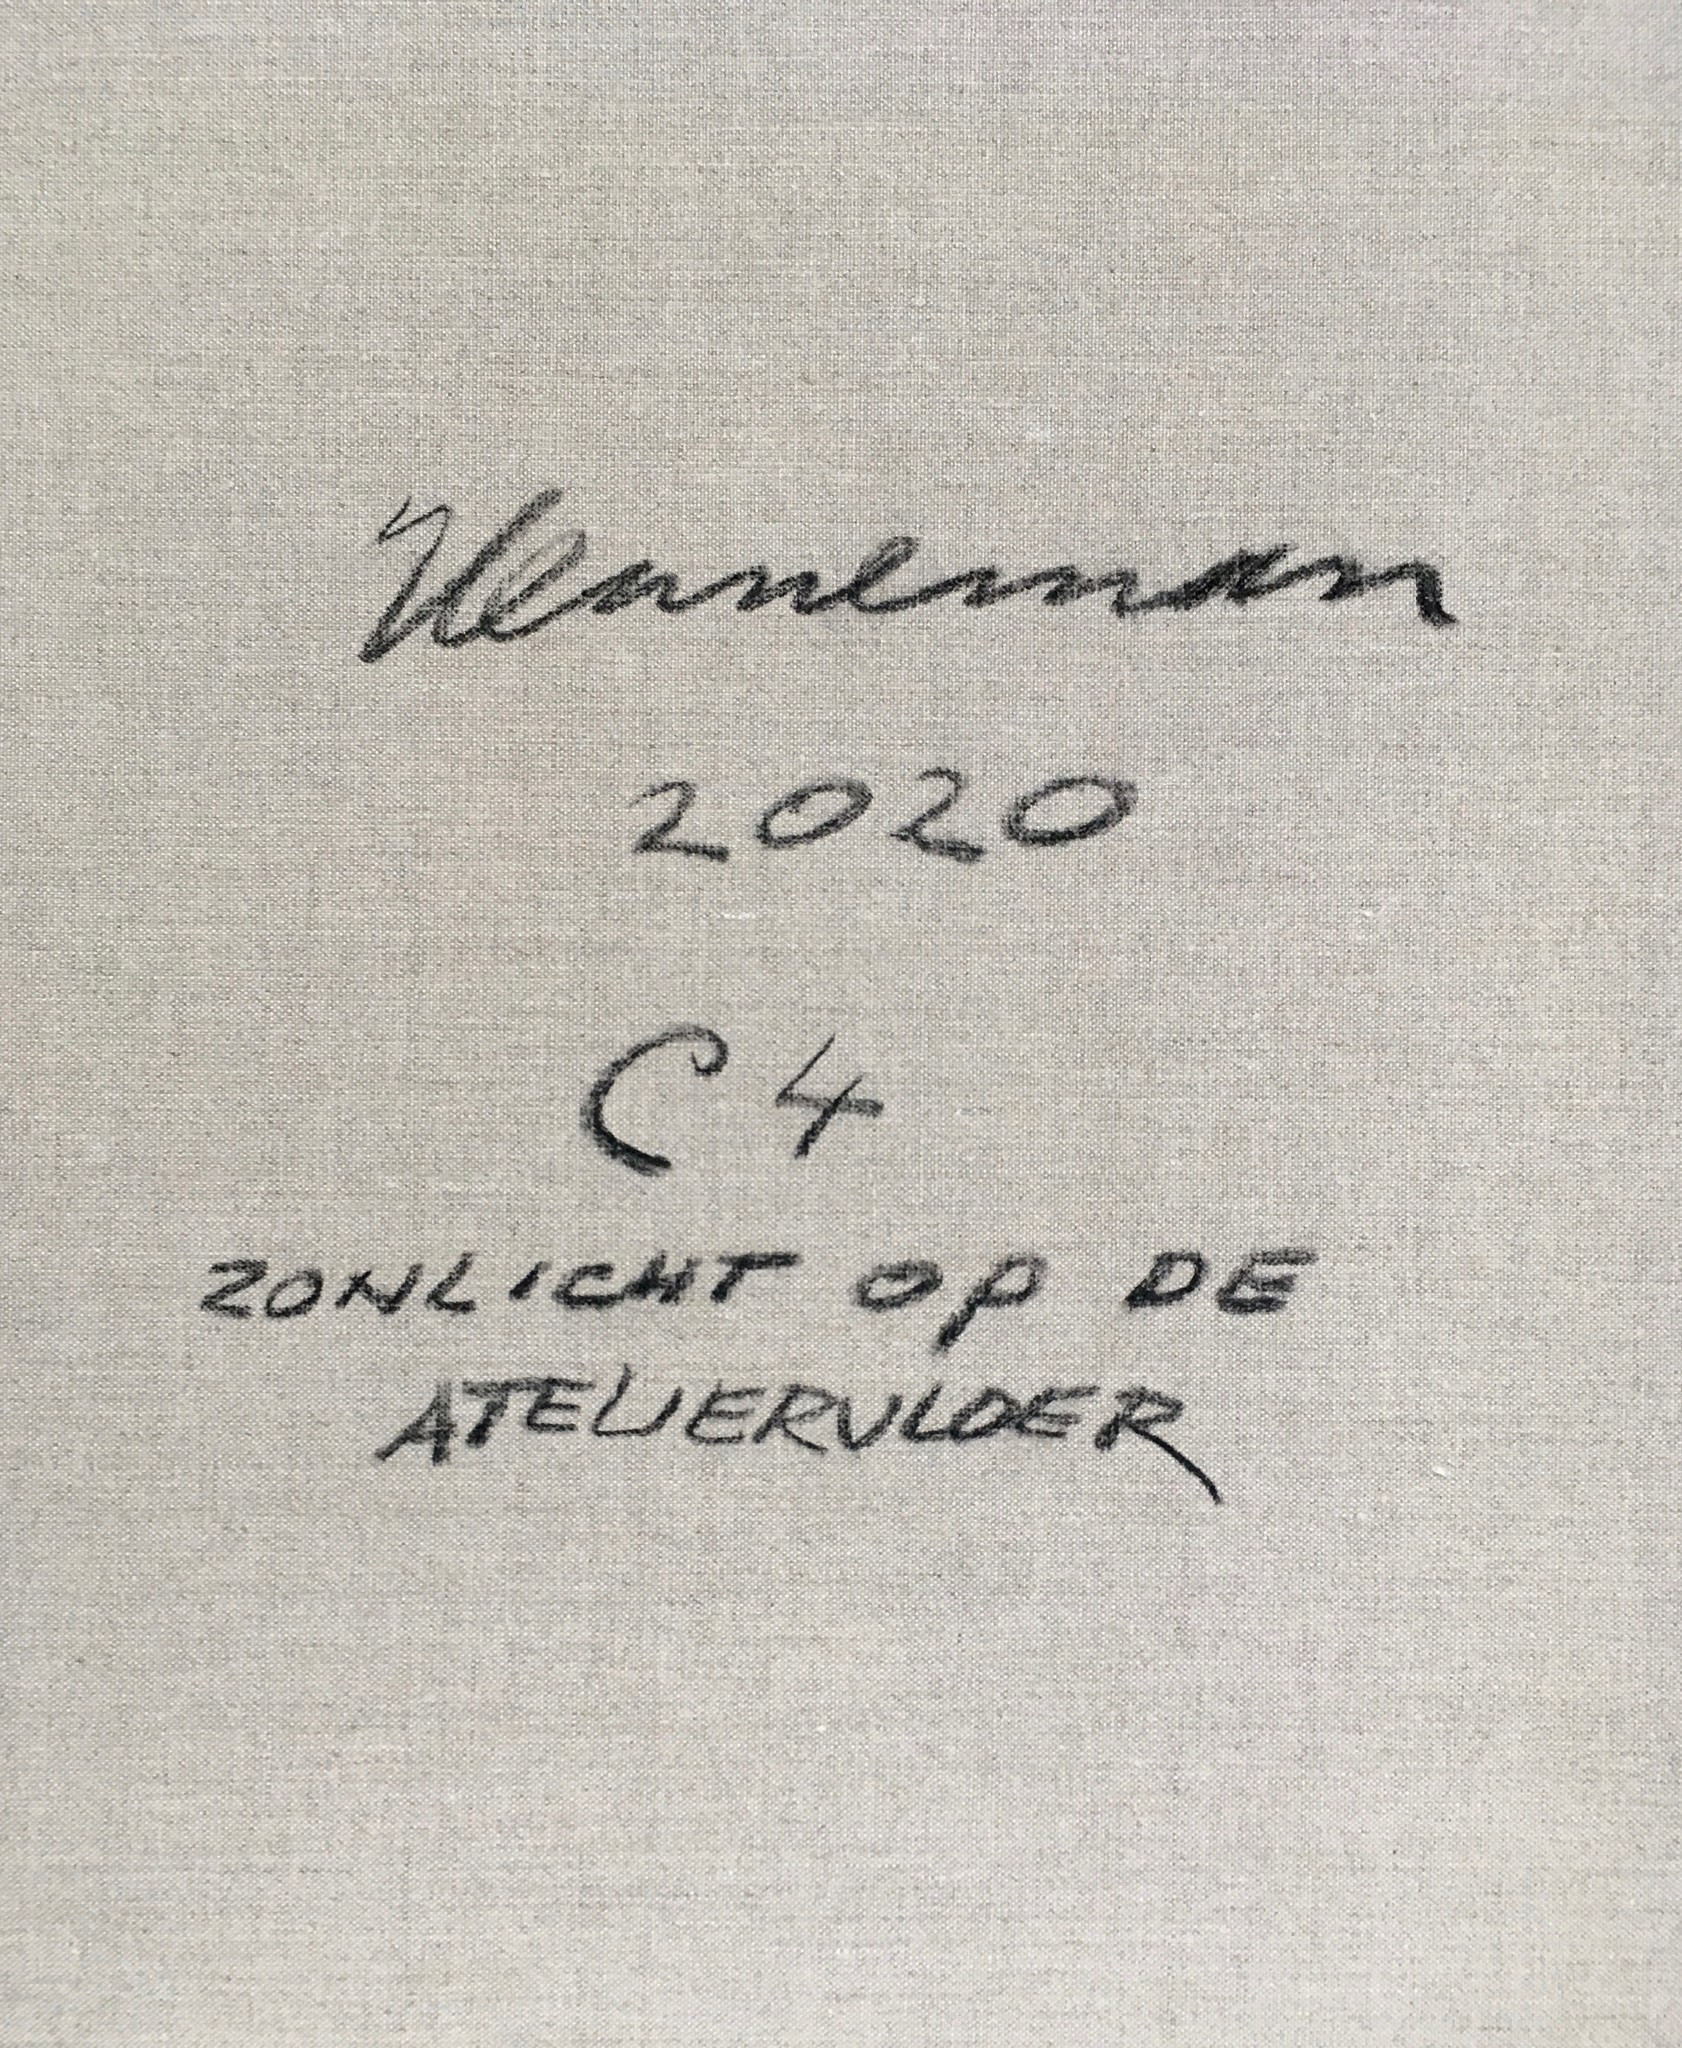 J. HENNEMAN | ZONLICHT OP DE ATELIERVLOER, 2020